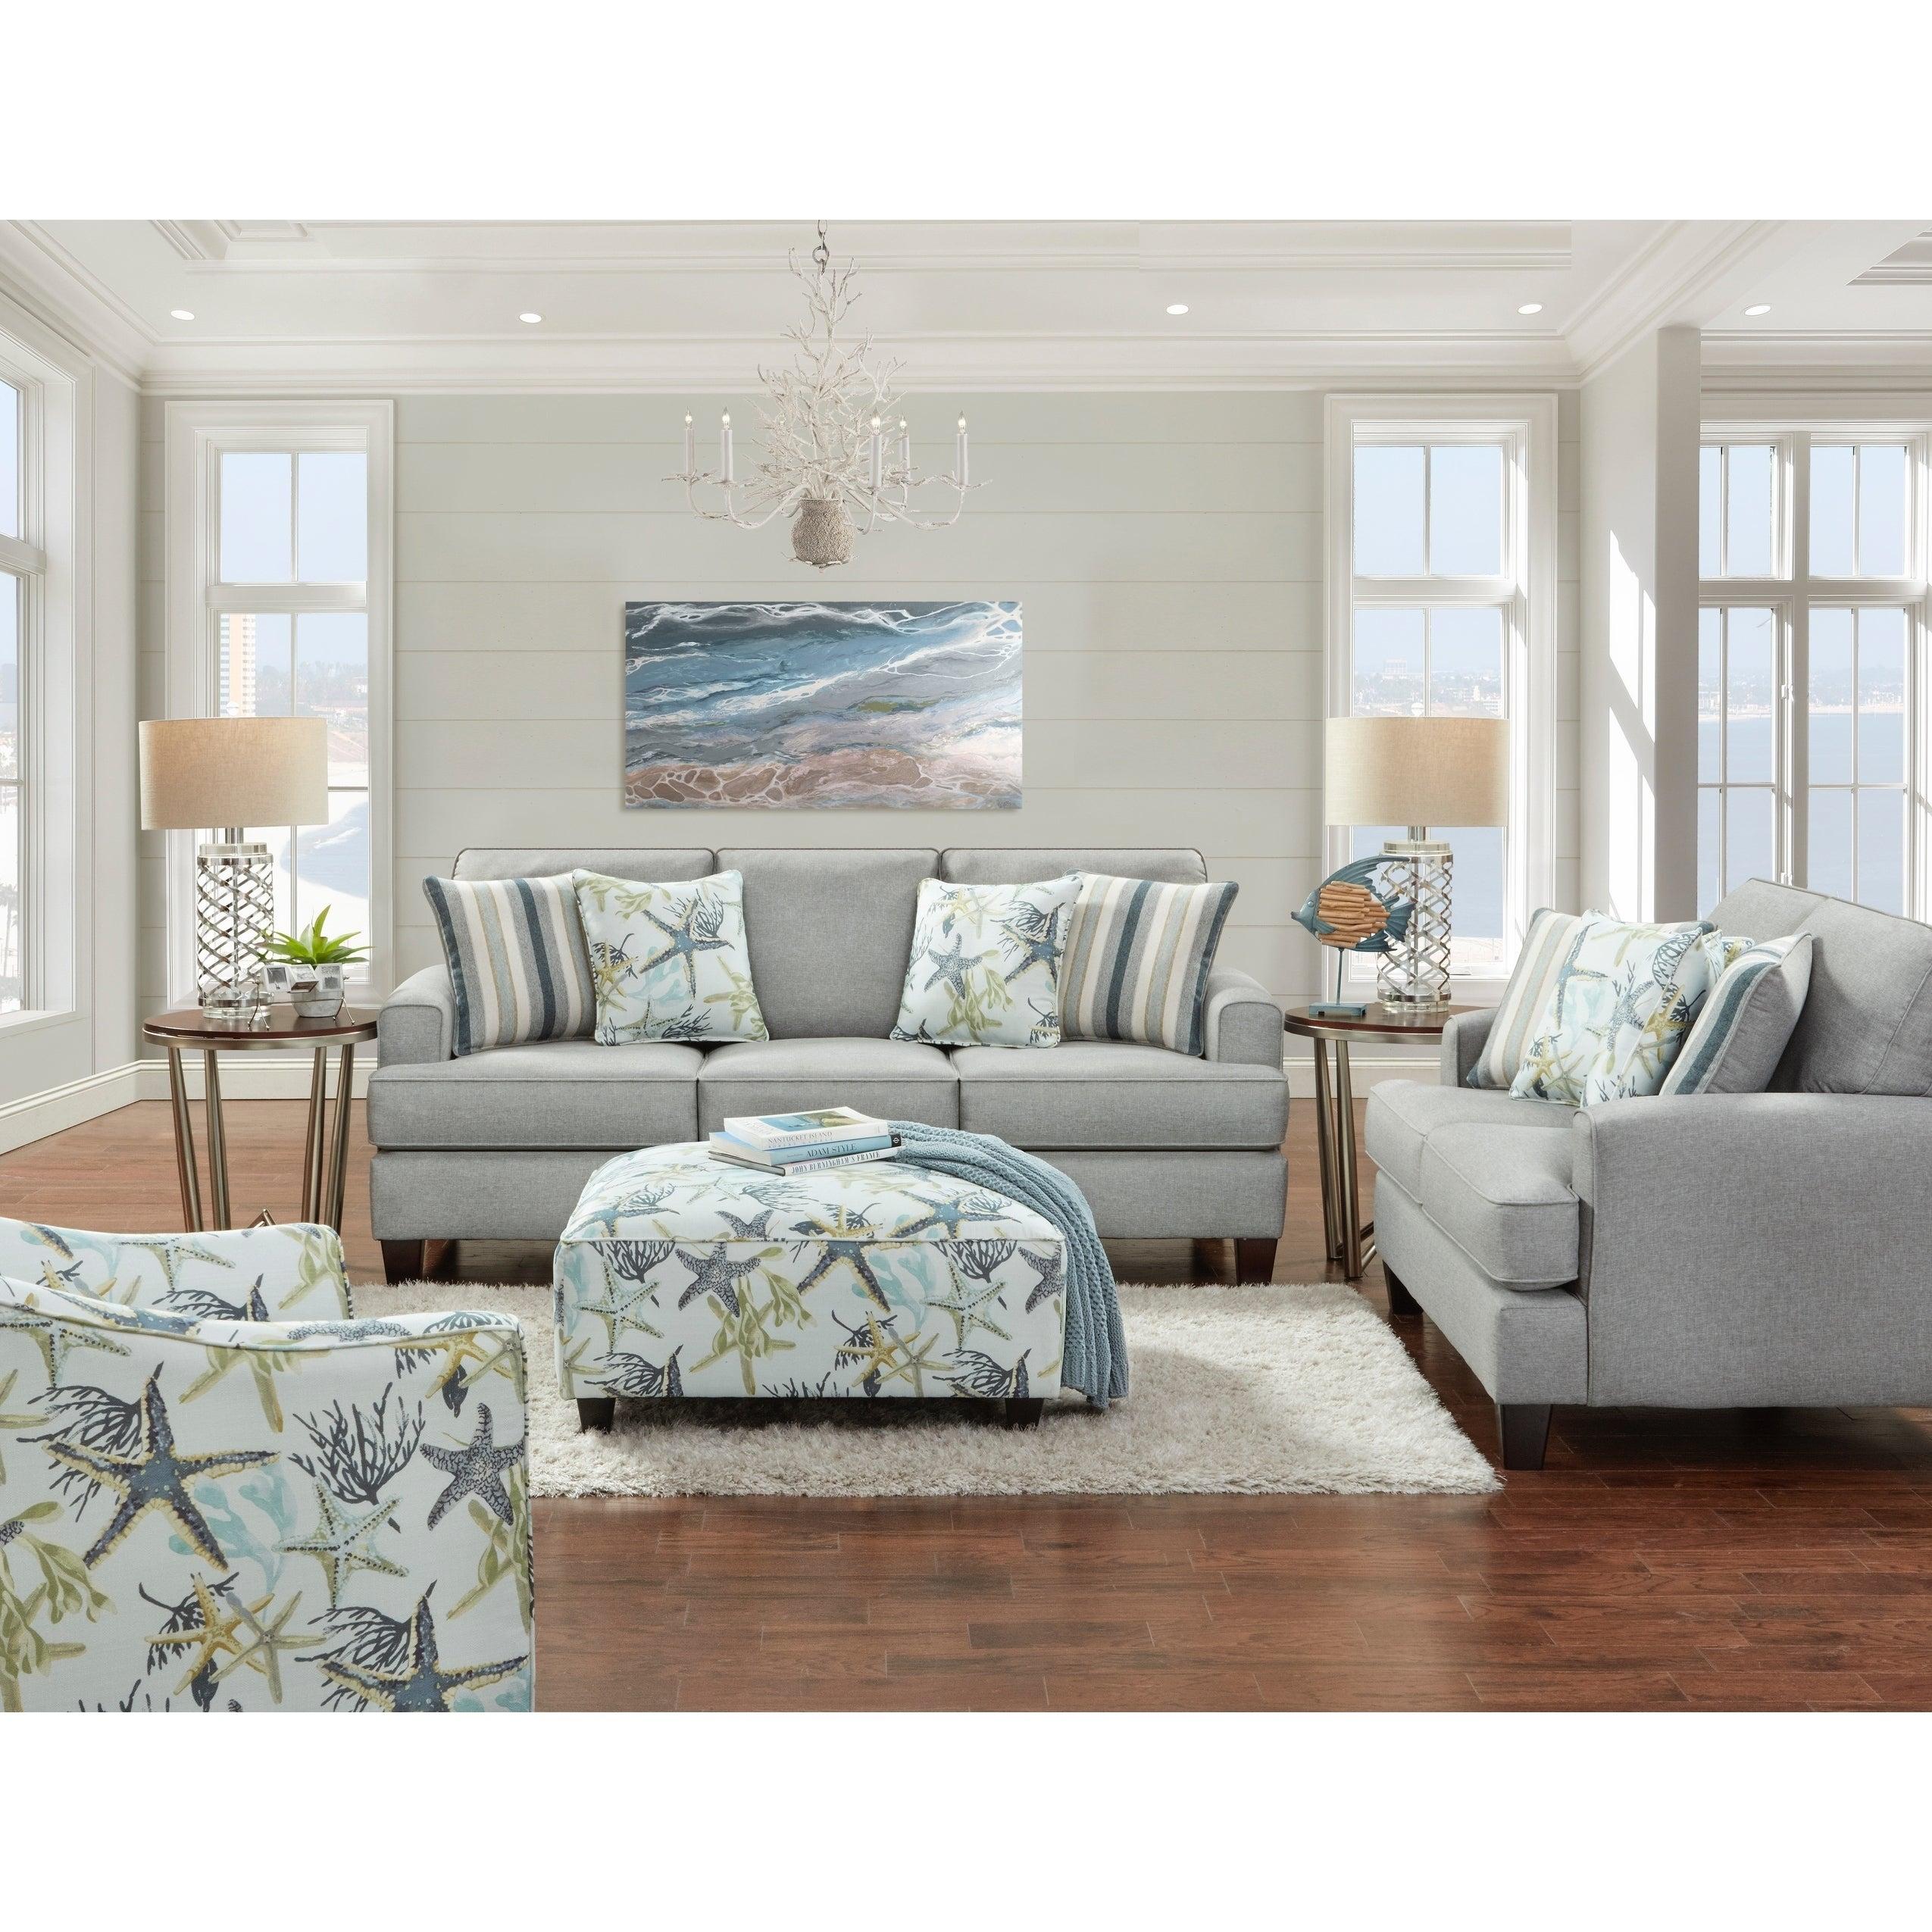 2600 Jitterbug Flax Sofa